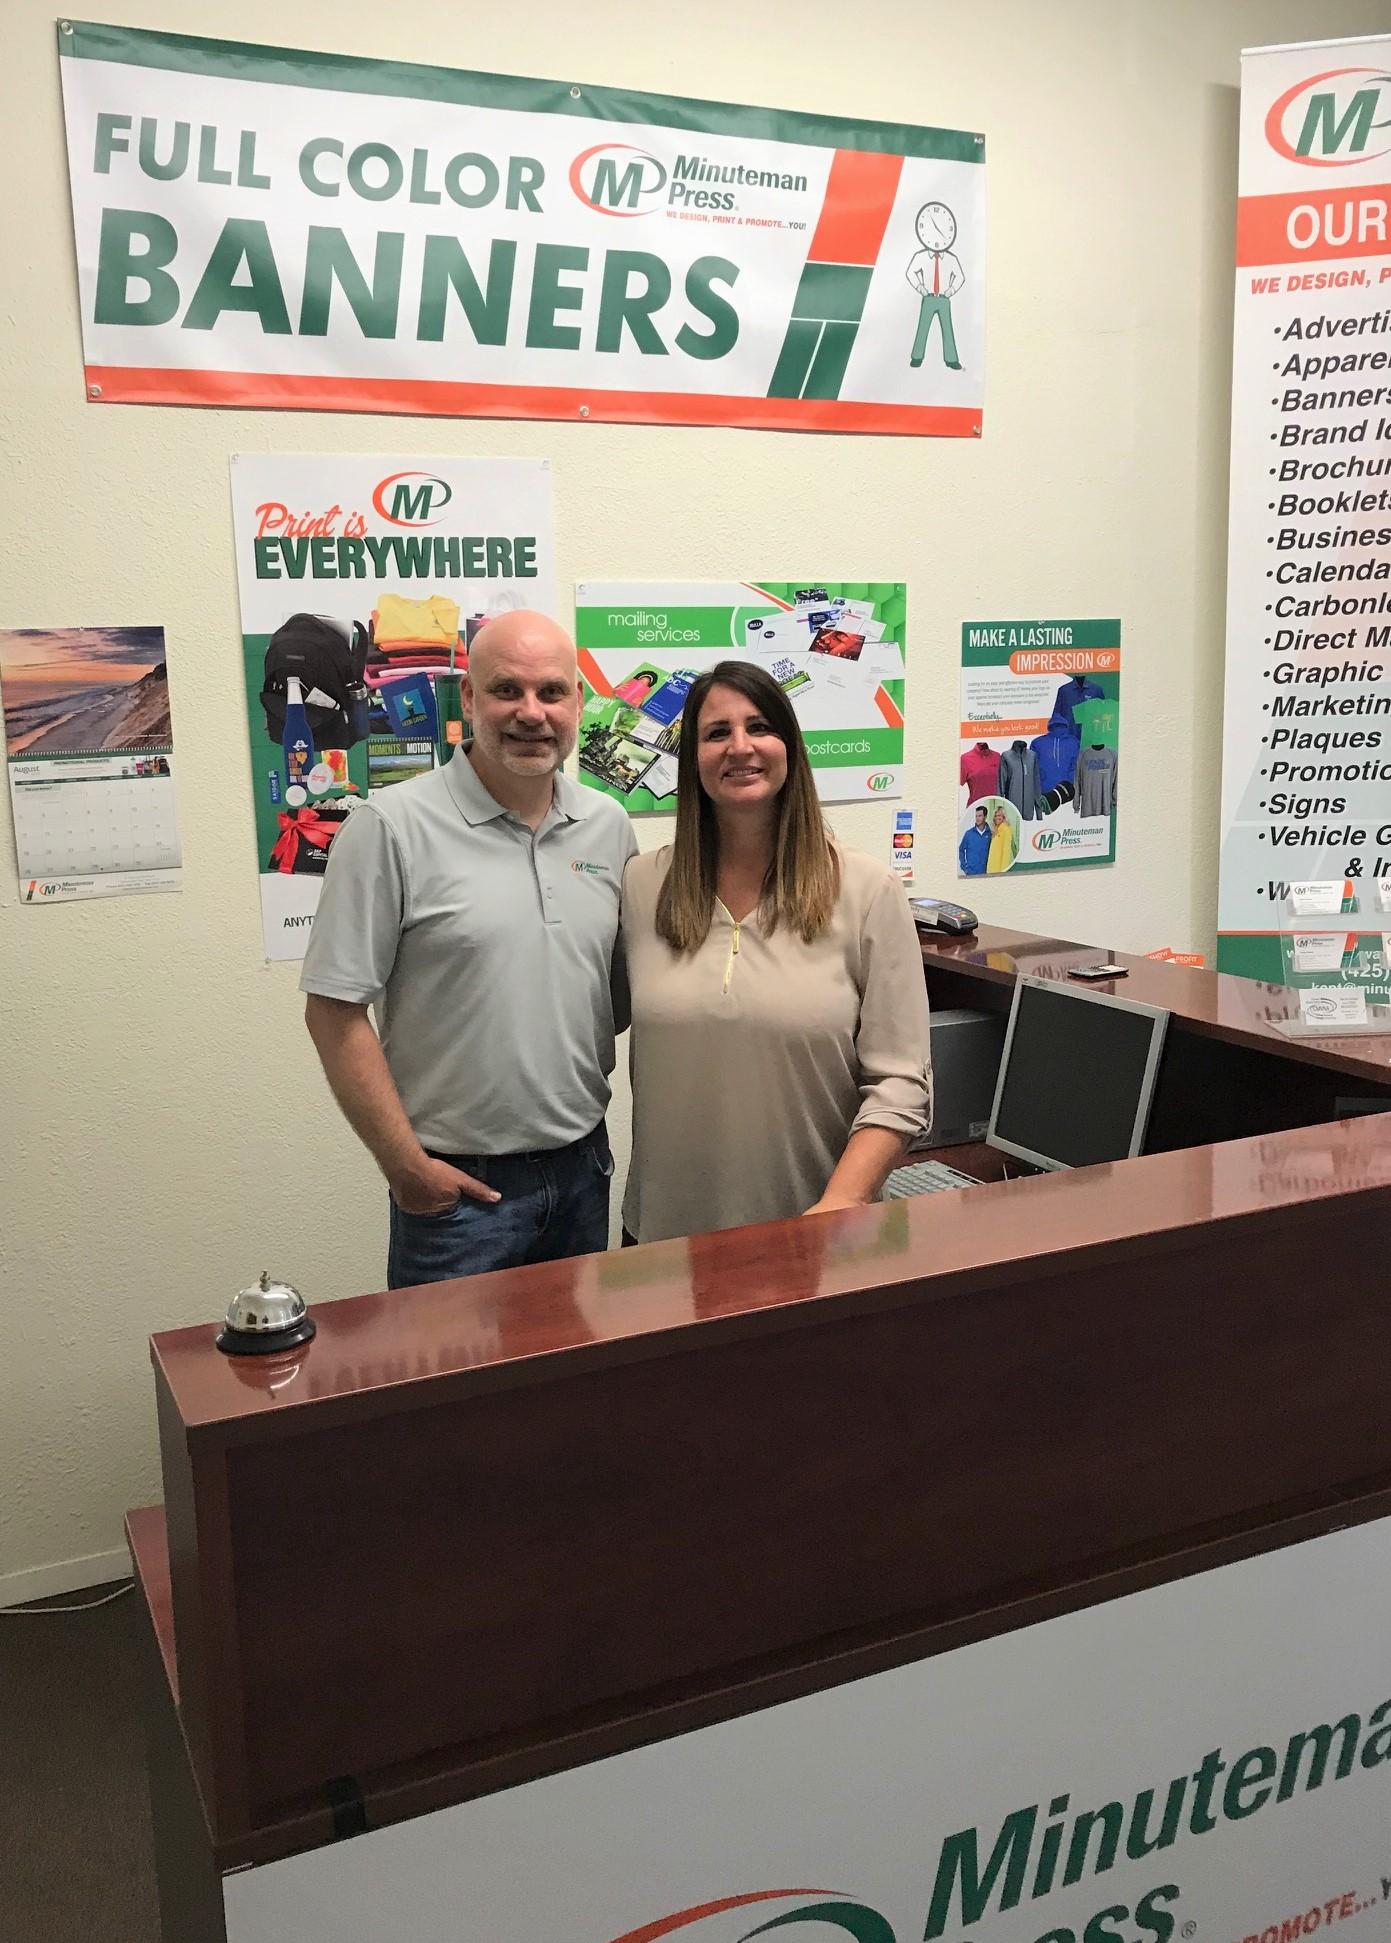 Jeff and Dawn Brown, owners, Minuteman Press franchise, Kent, Washington. http://www.minutemanpressfranchise.com